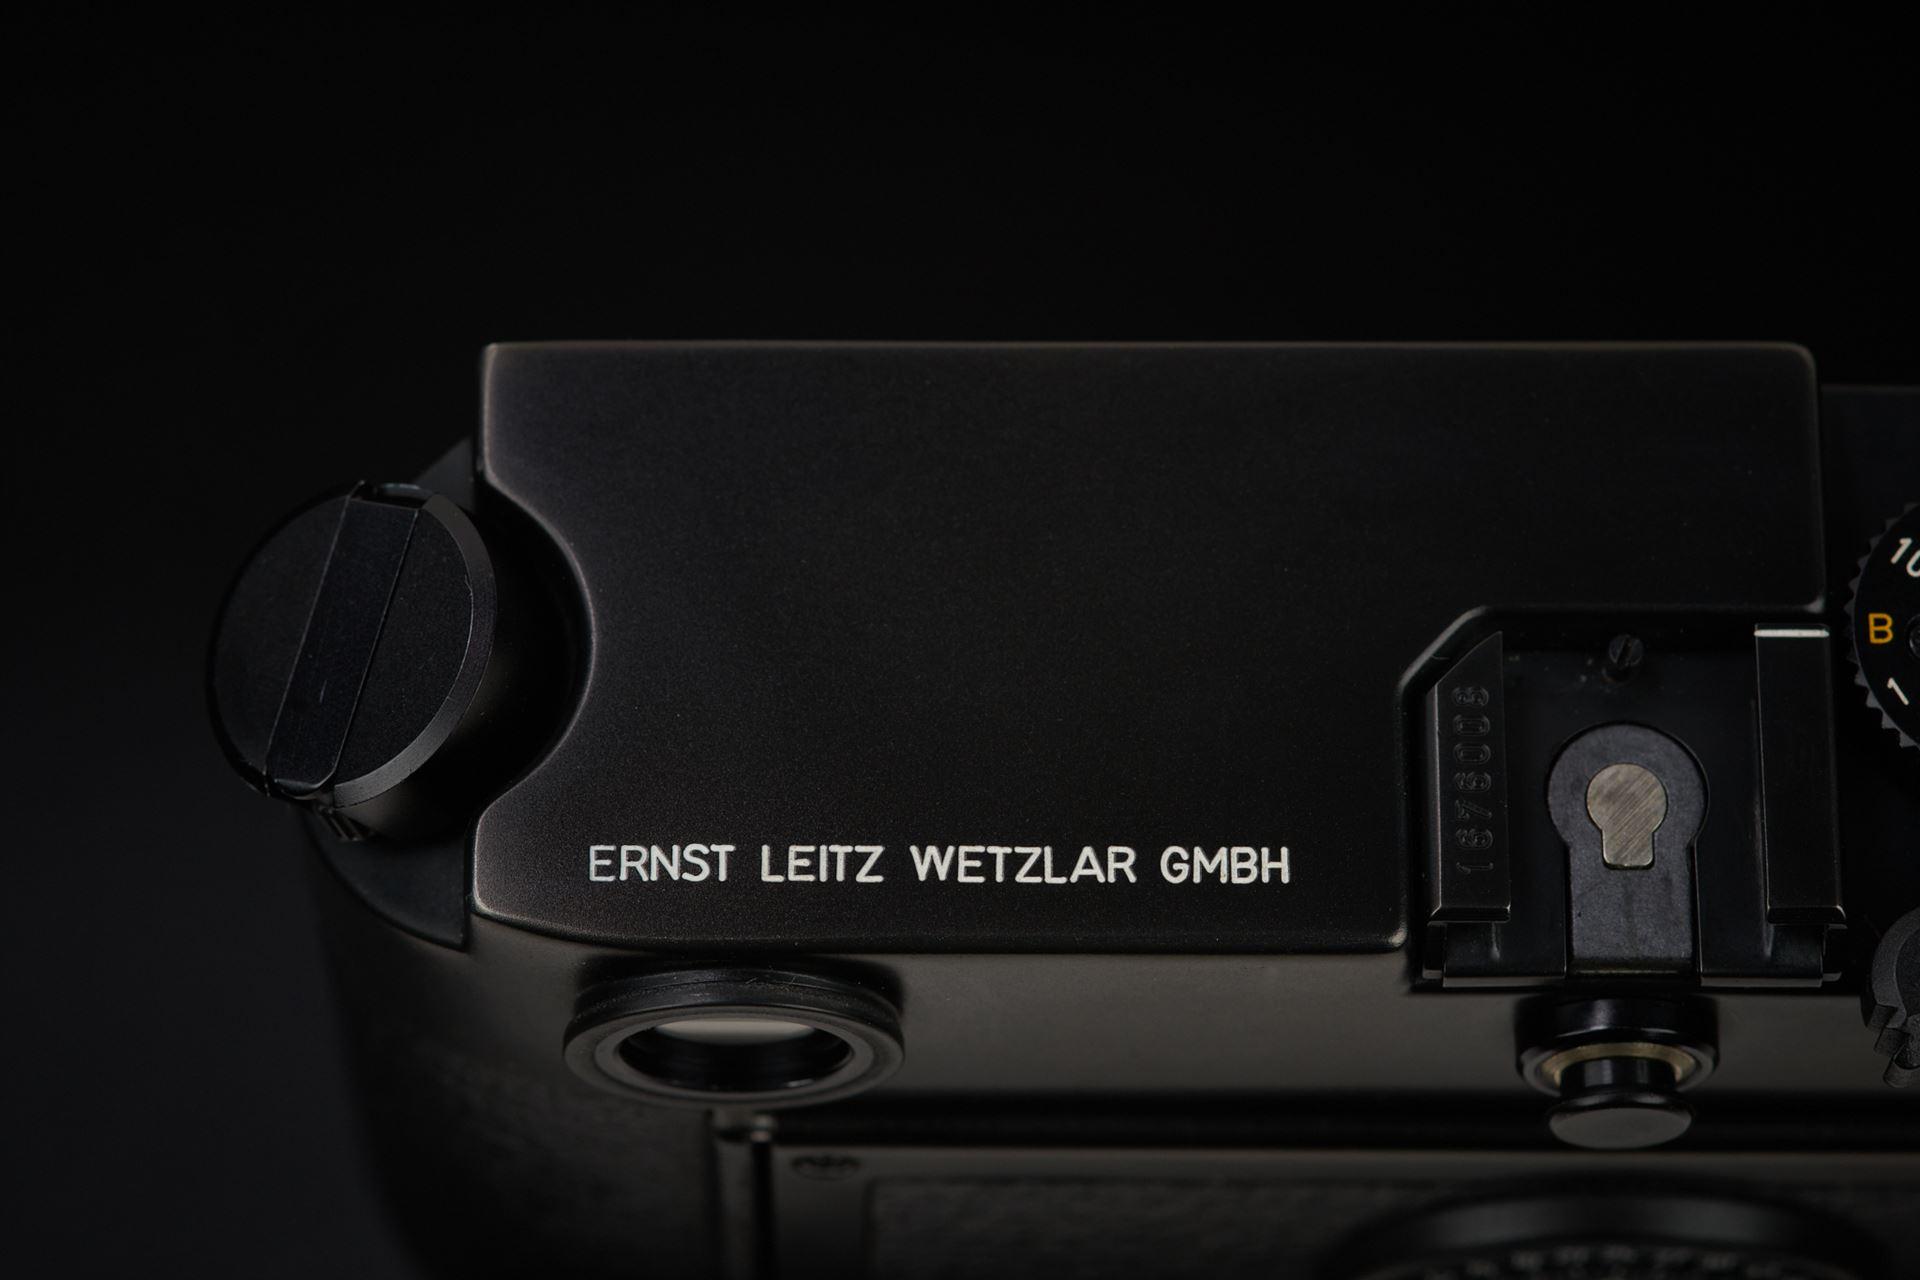 Picture of leica m6 0.72 black chrome